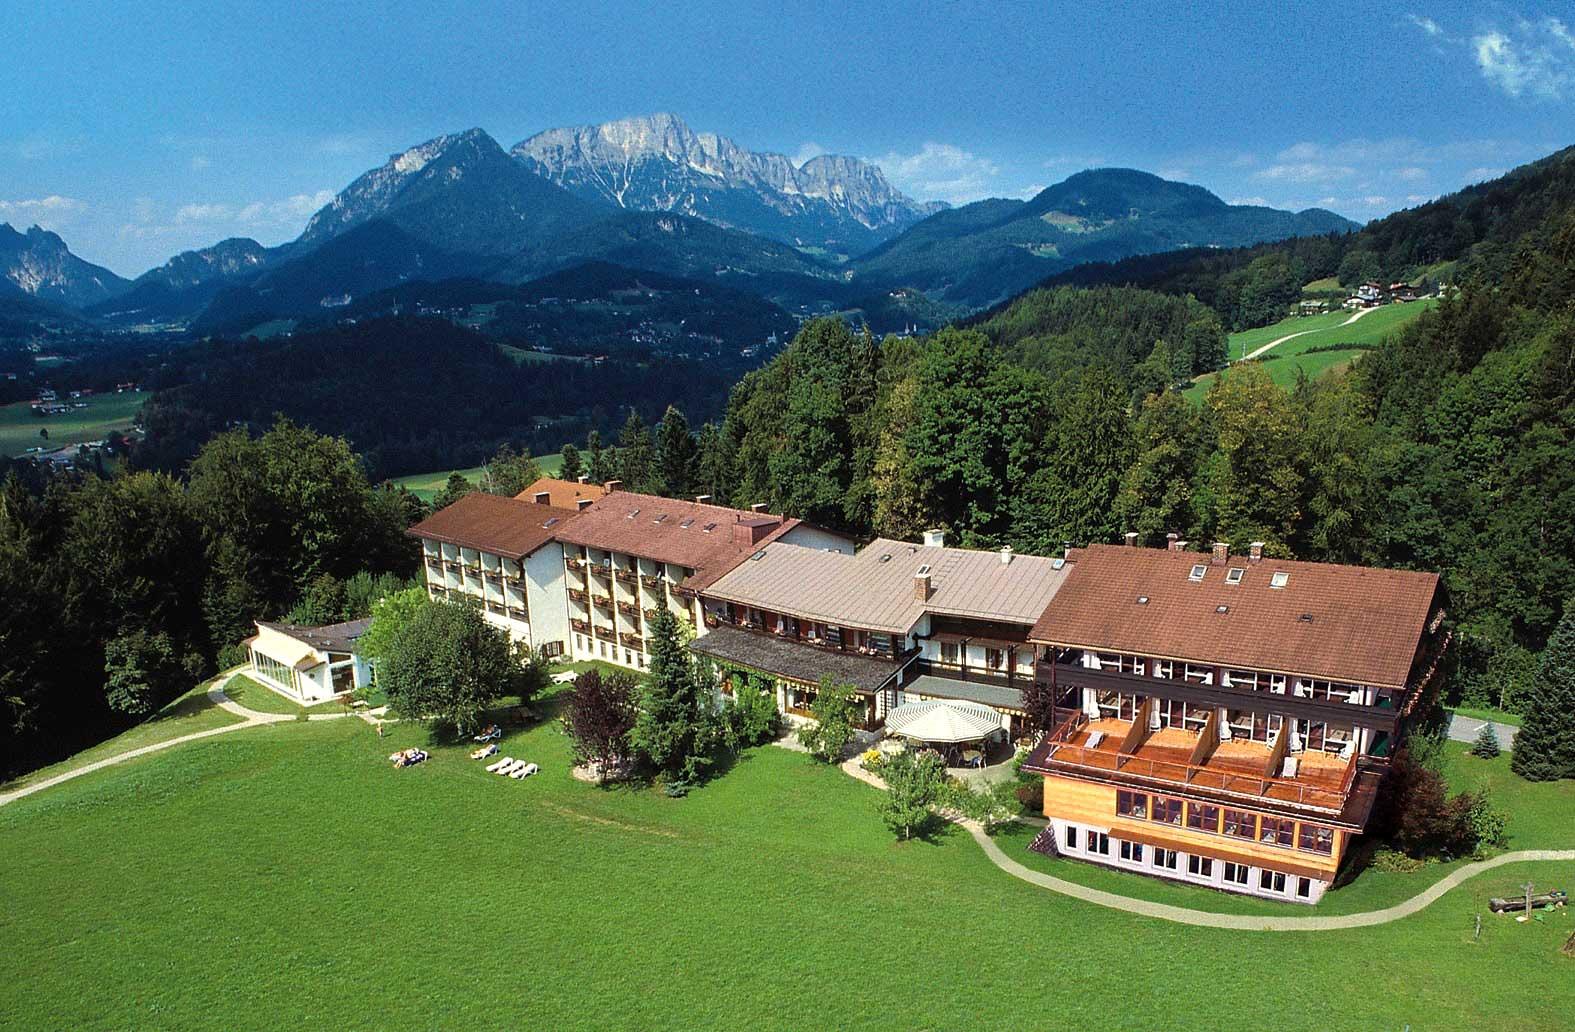 die 25 top hotels in deutschland berchtesgadener land blog. Black Bedroom Furniture Sets. Home Design Ideas